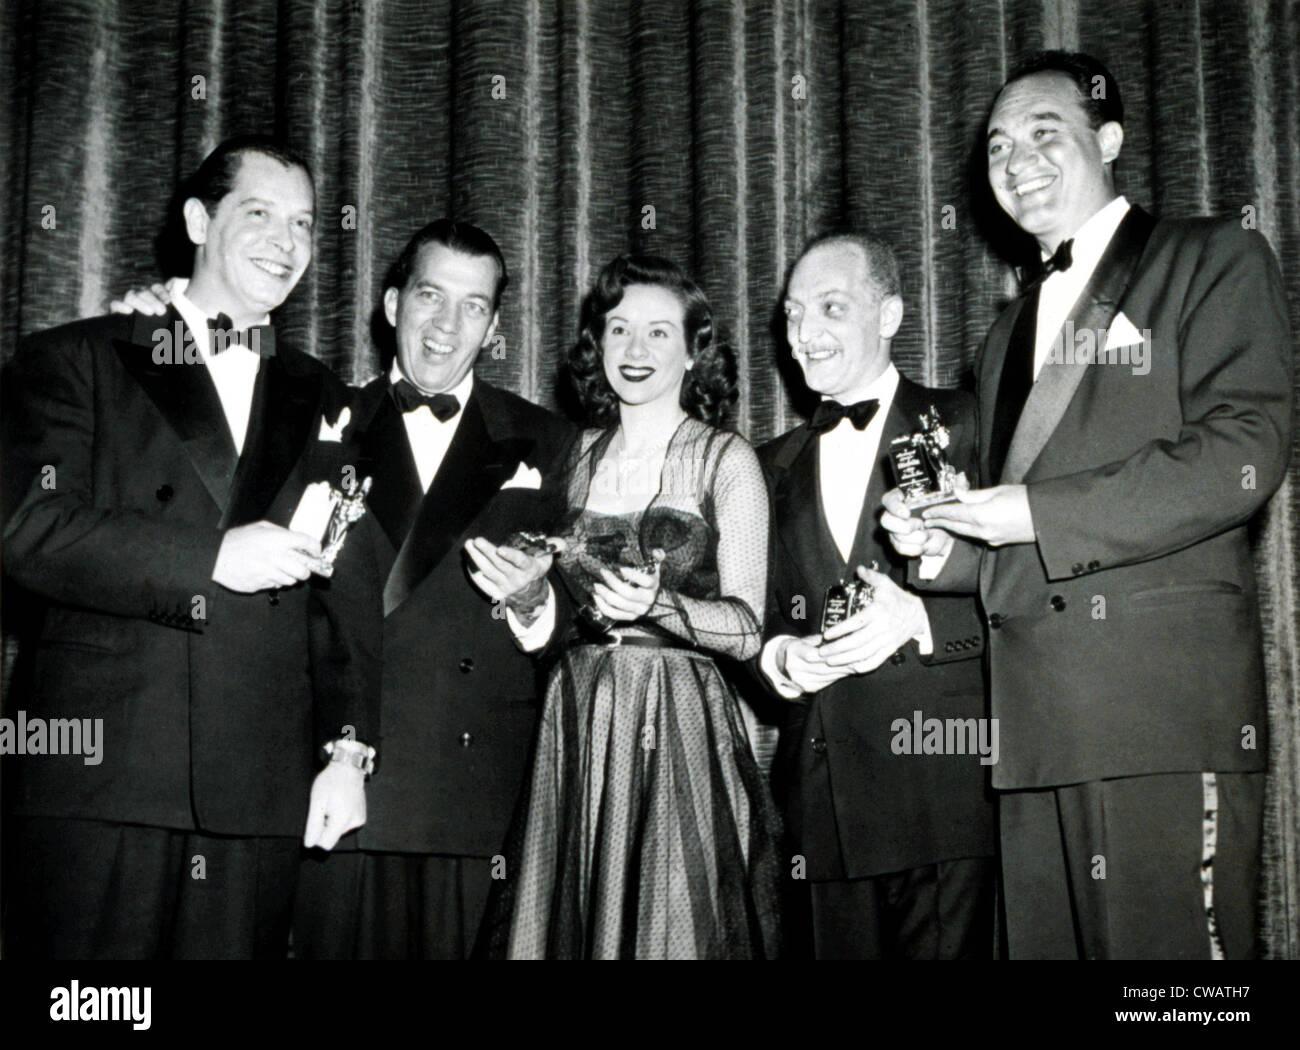 Milton Berle, Ed Sullivan, Fran Warren, Everett Sloane, Mel Allen at the Michael Awards, 1950. Courtesy: CSU Archives - Stock Image